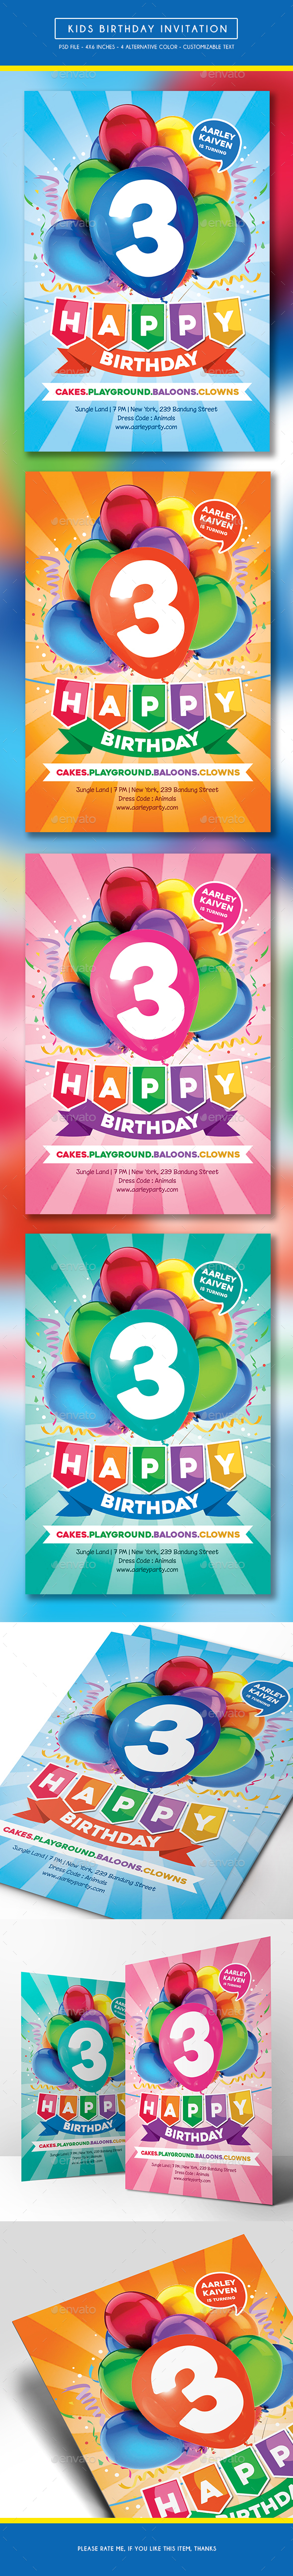 Kids Birthday Invitation - Birthday Greeting Cards